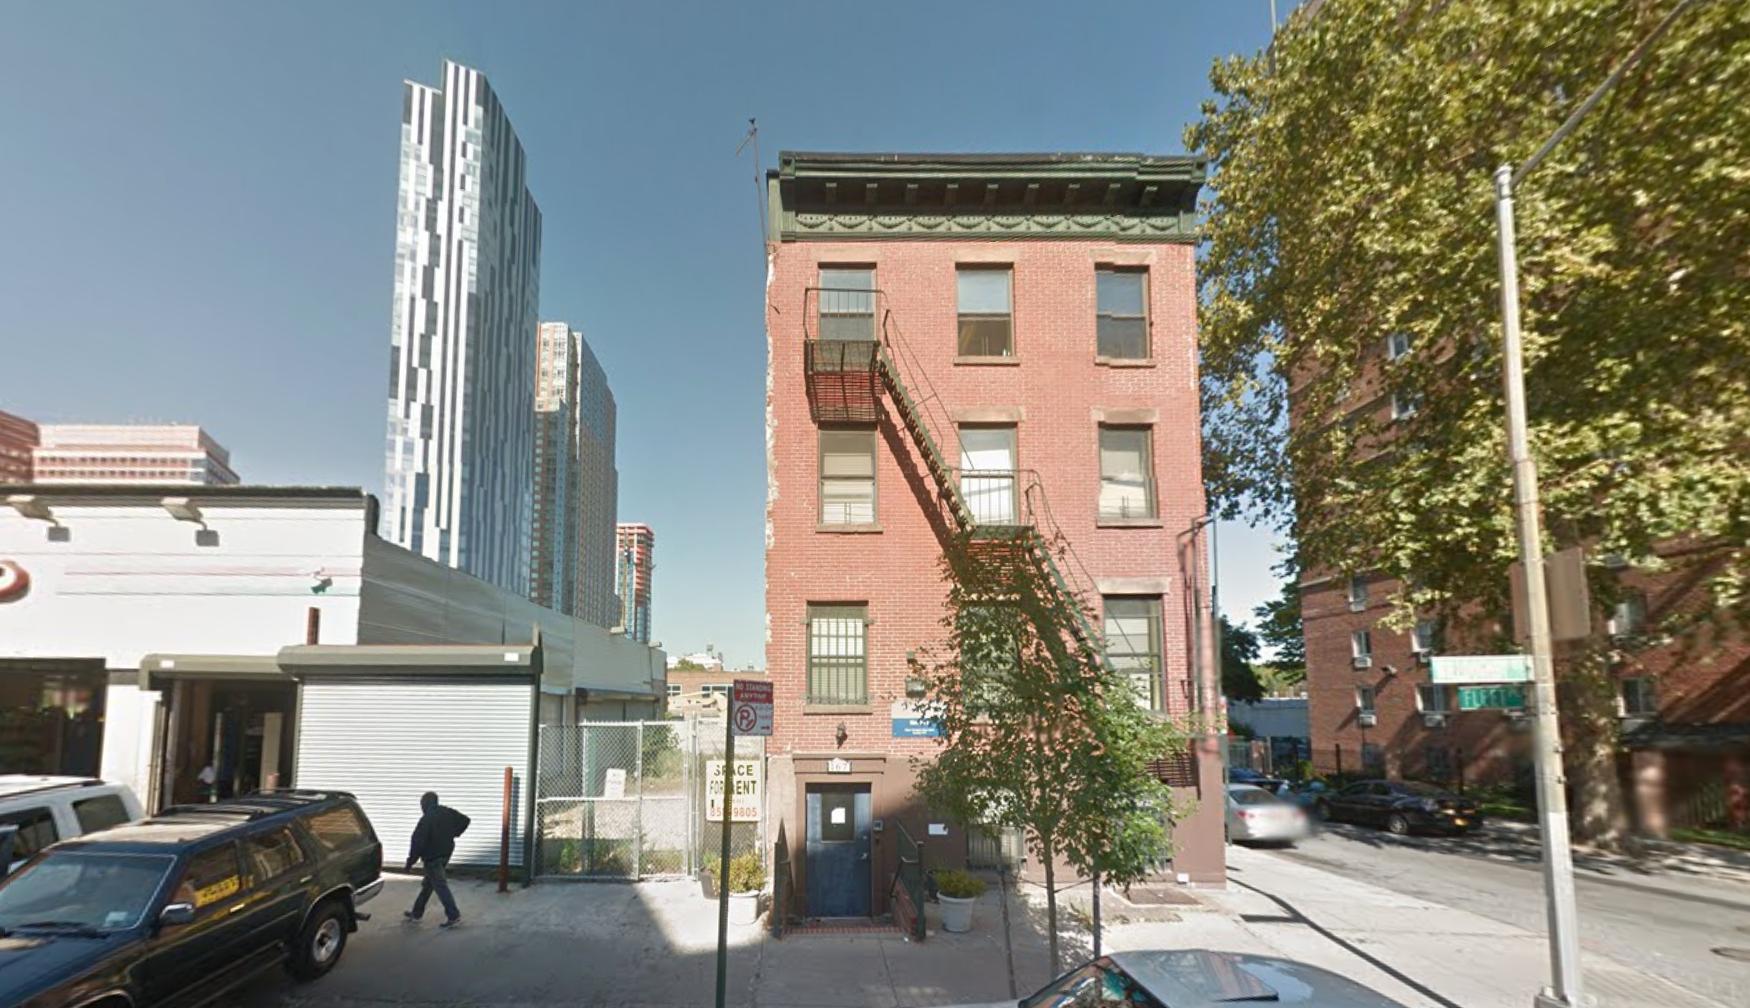 112 Fleet Place, image via Google Maps